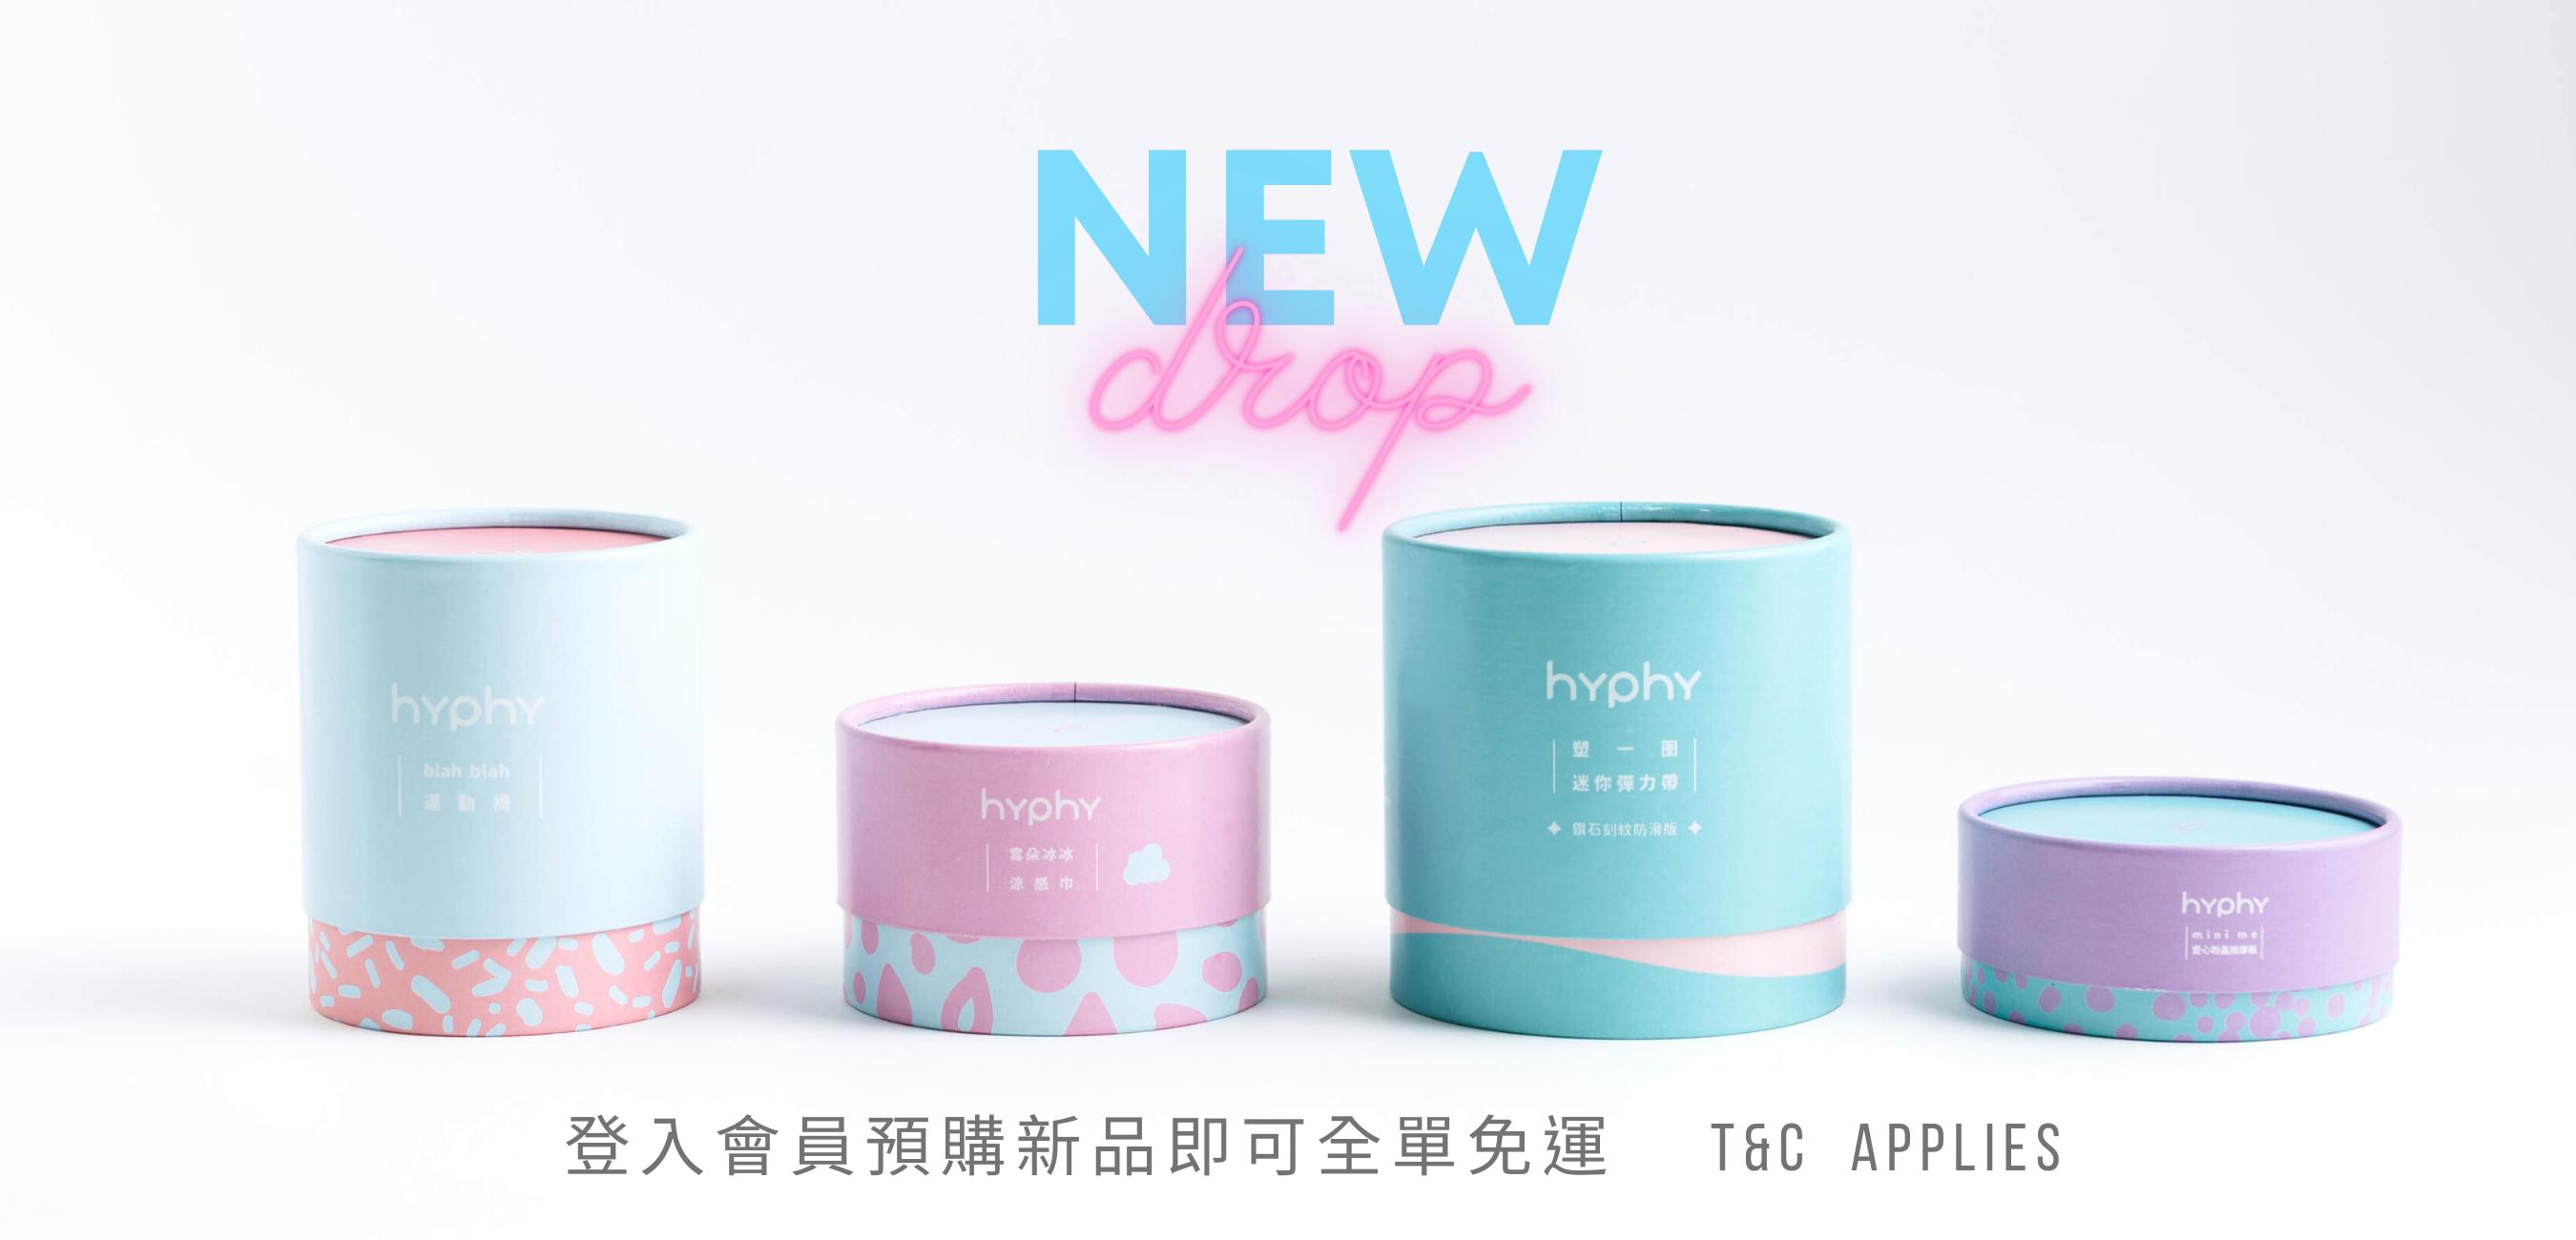 Hyphy 新品上市,預購免運優惠,彈力帶,瑜伽圈,健身環,涼感巾